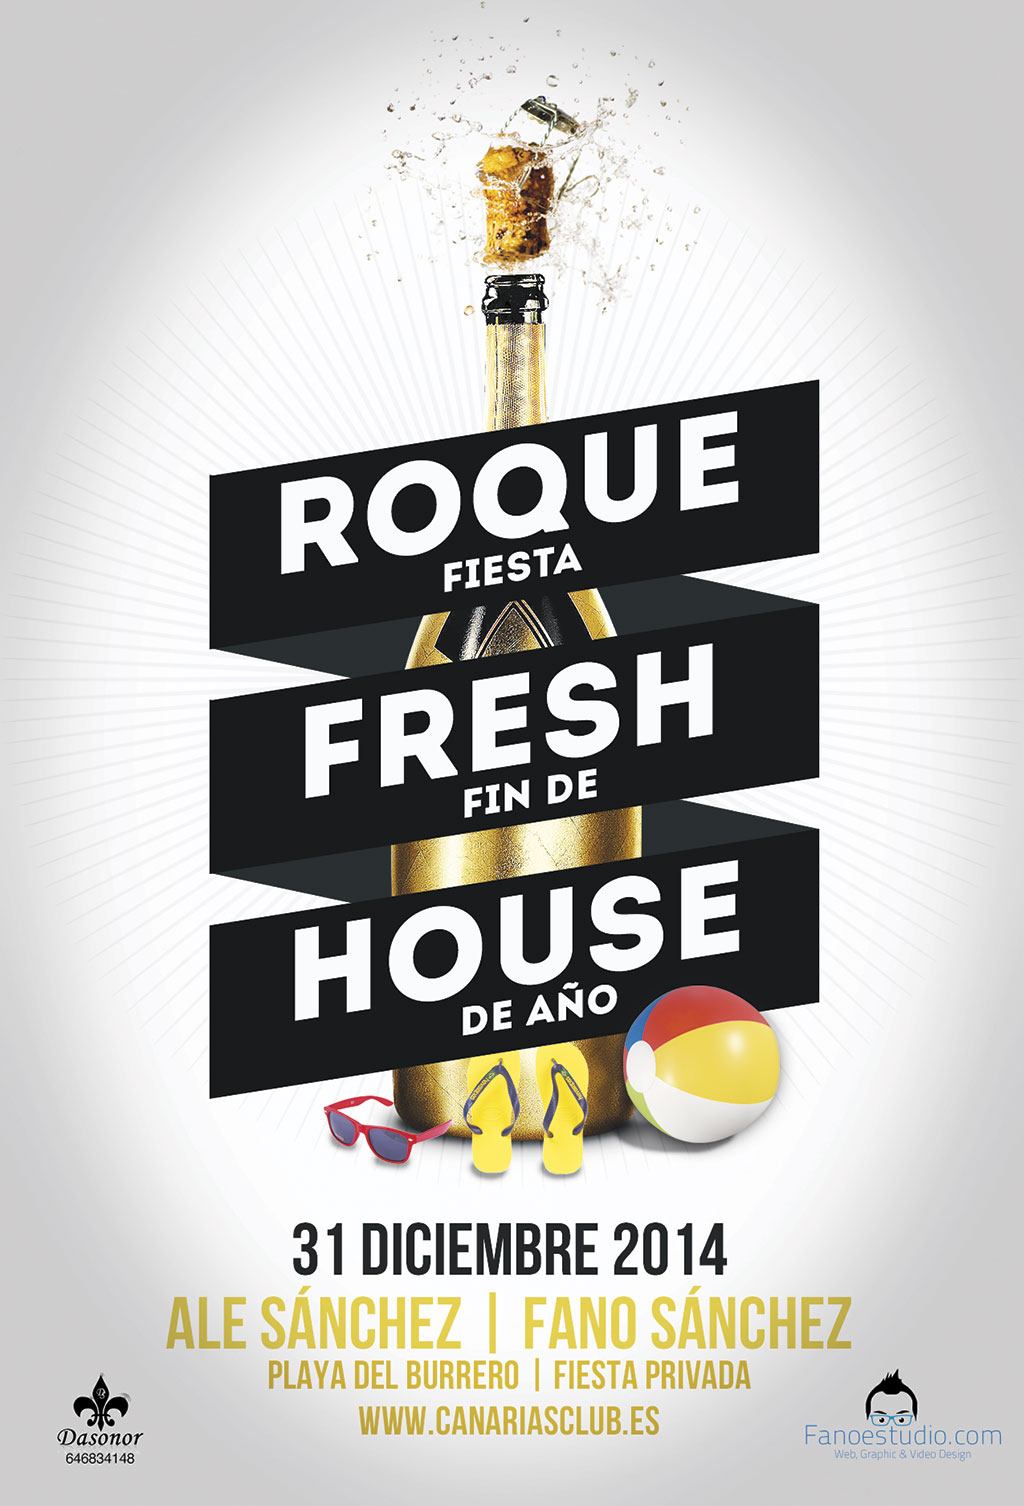 Fano Sánchez – Roque Fresh House 2014